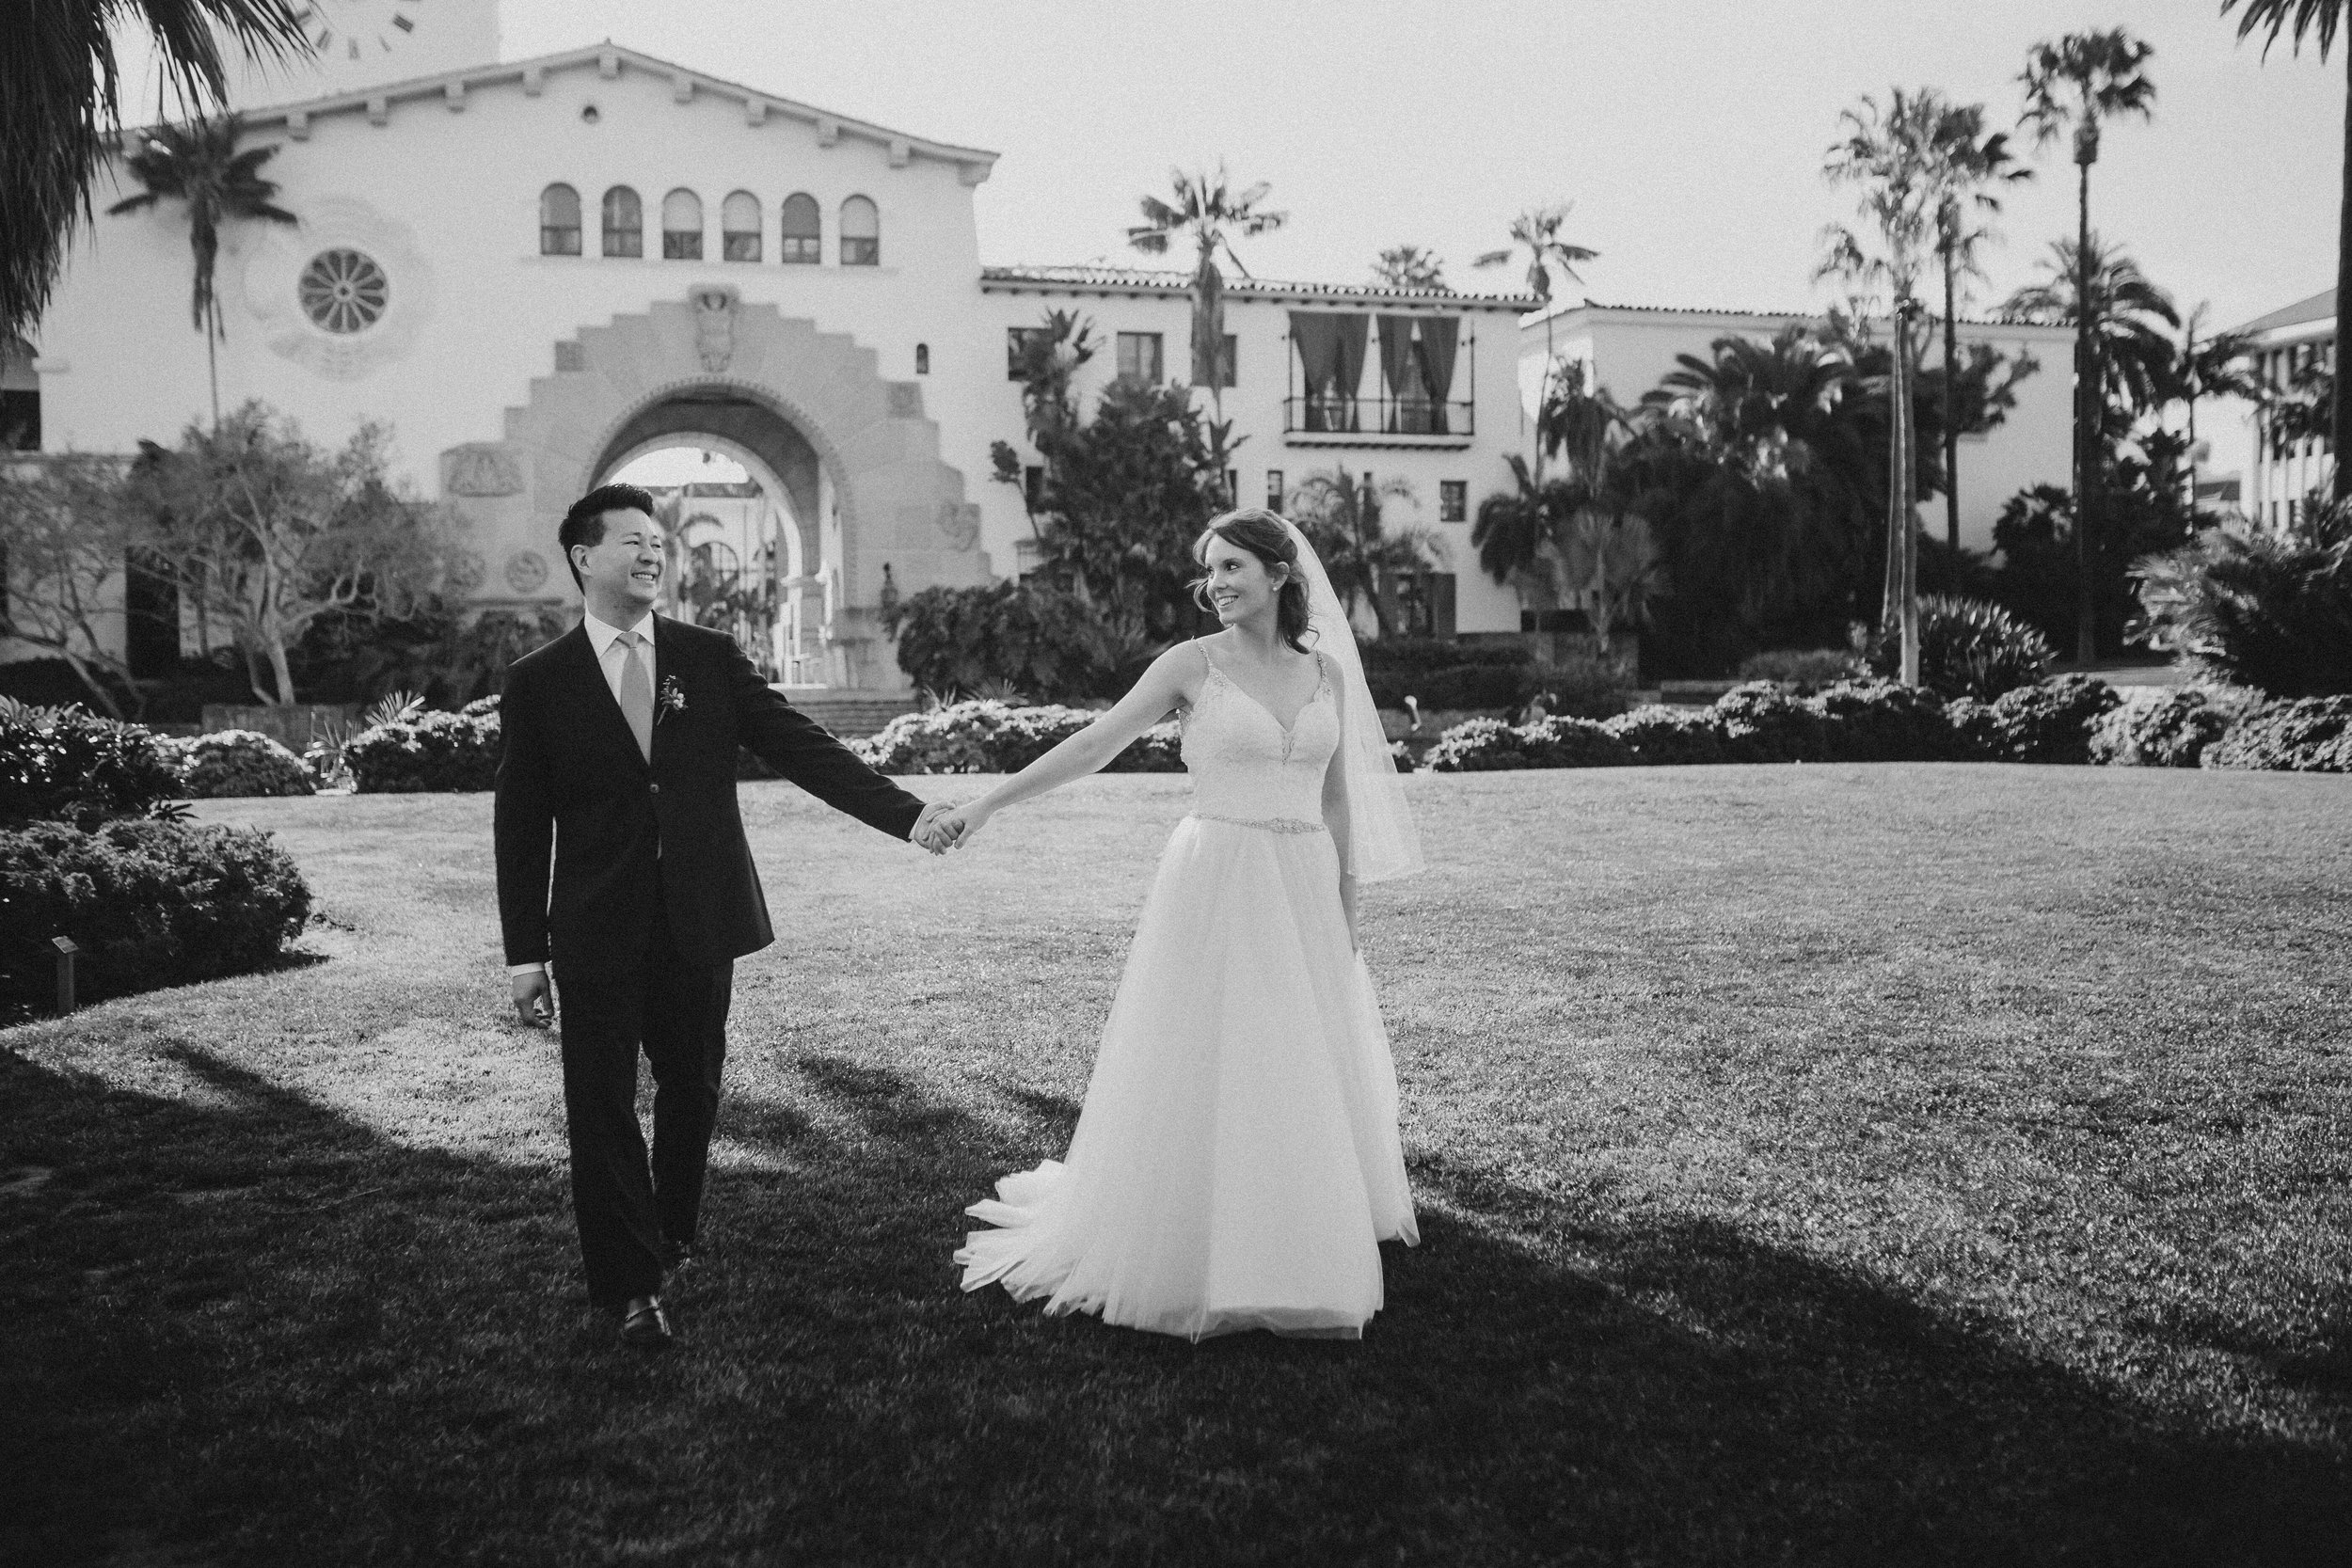 www.santabarbawedding.com | Venue: Santa Barbara Courthouse | Photography: Ryanne Bee Photography | Officiant: Santa Barbara Classic Weddings | Bride and Groom Romantic Walk